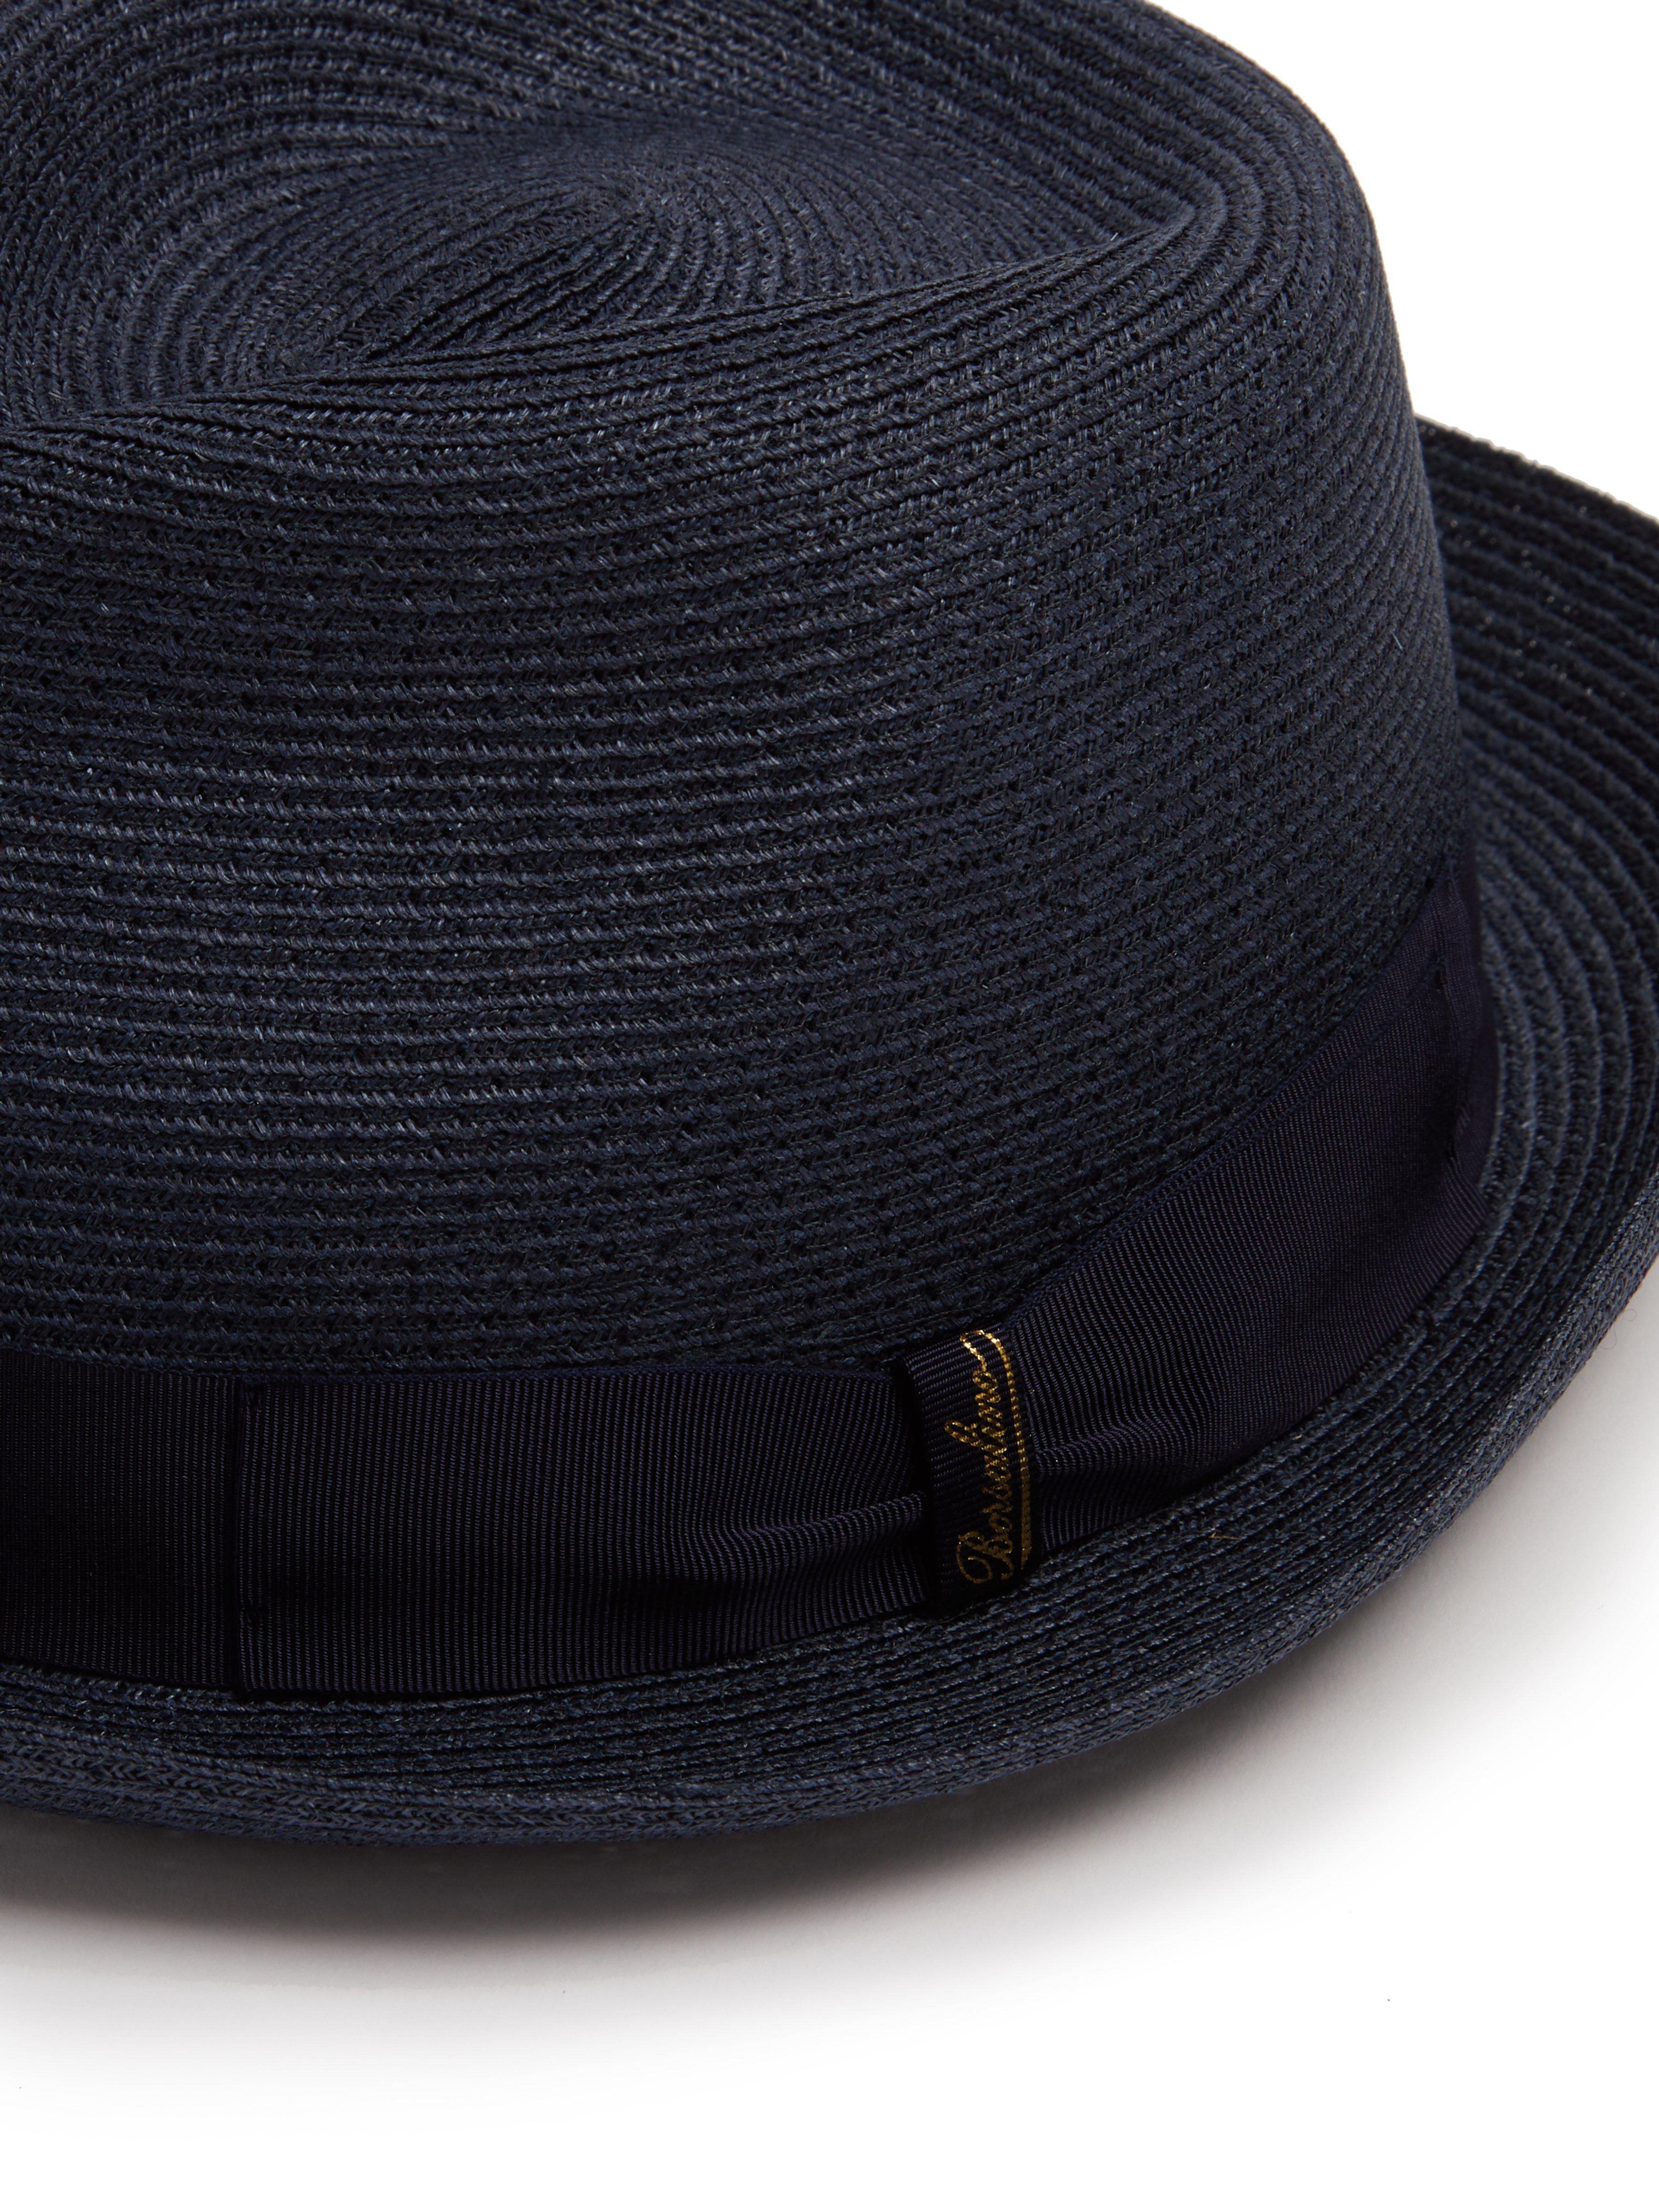 d61043e139a Borsalino Block Colour Panama Hat in Blue for Men - Lyst